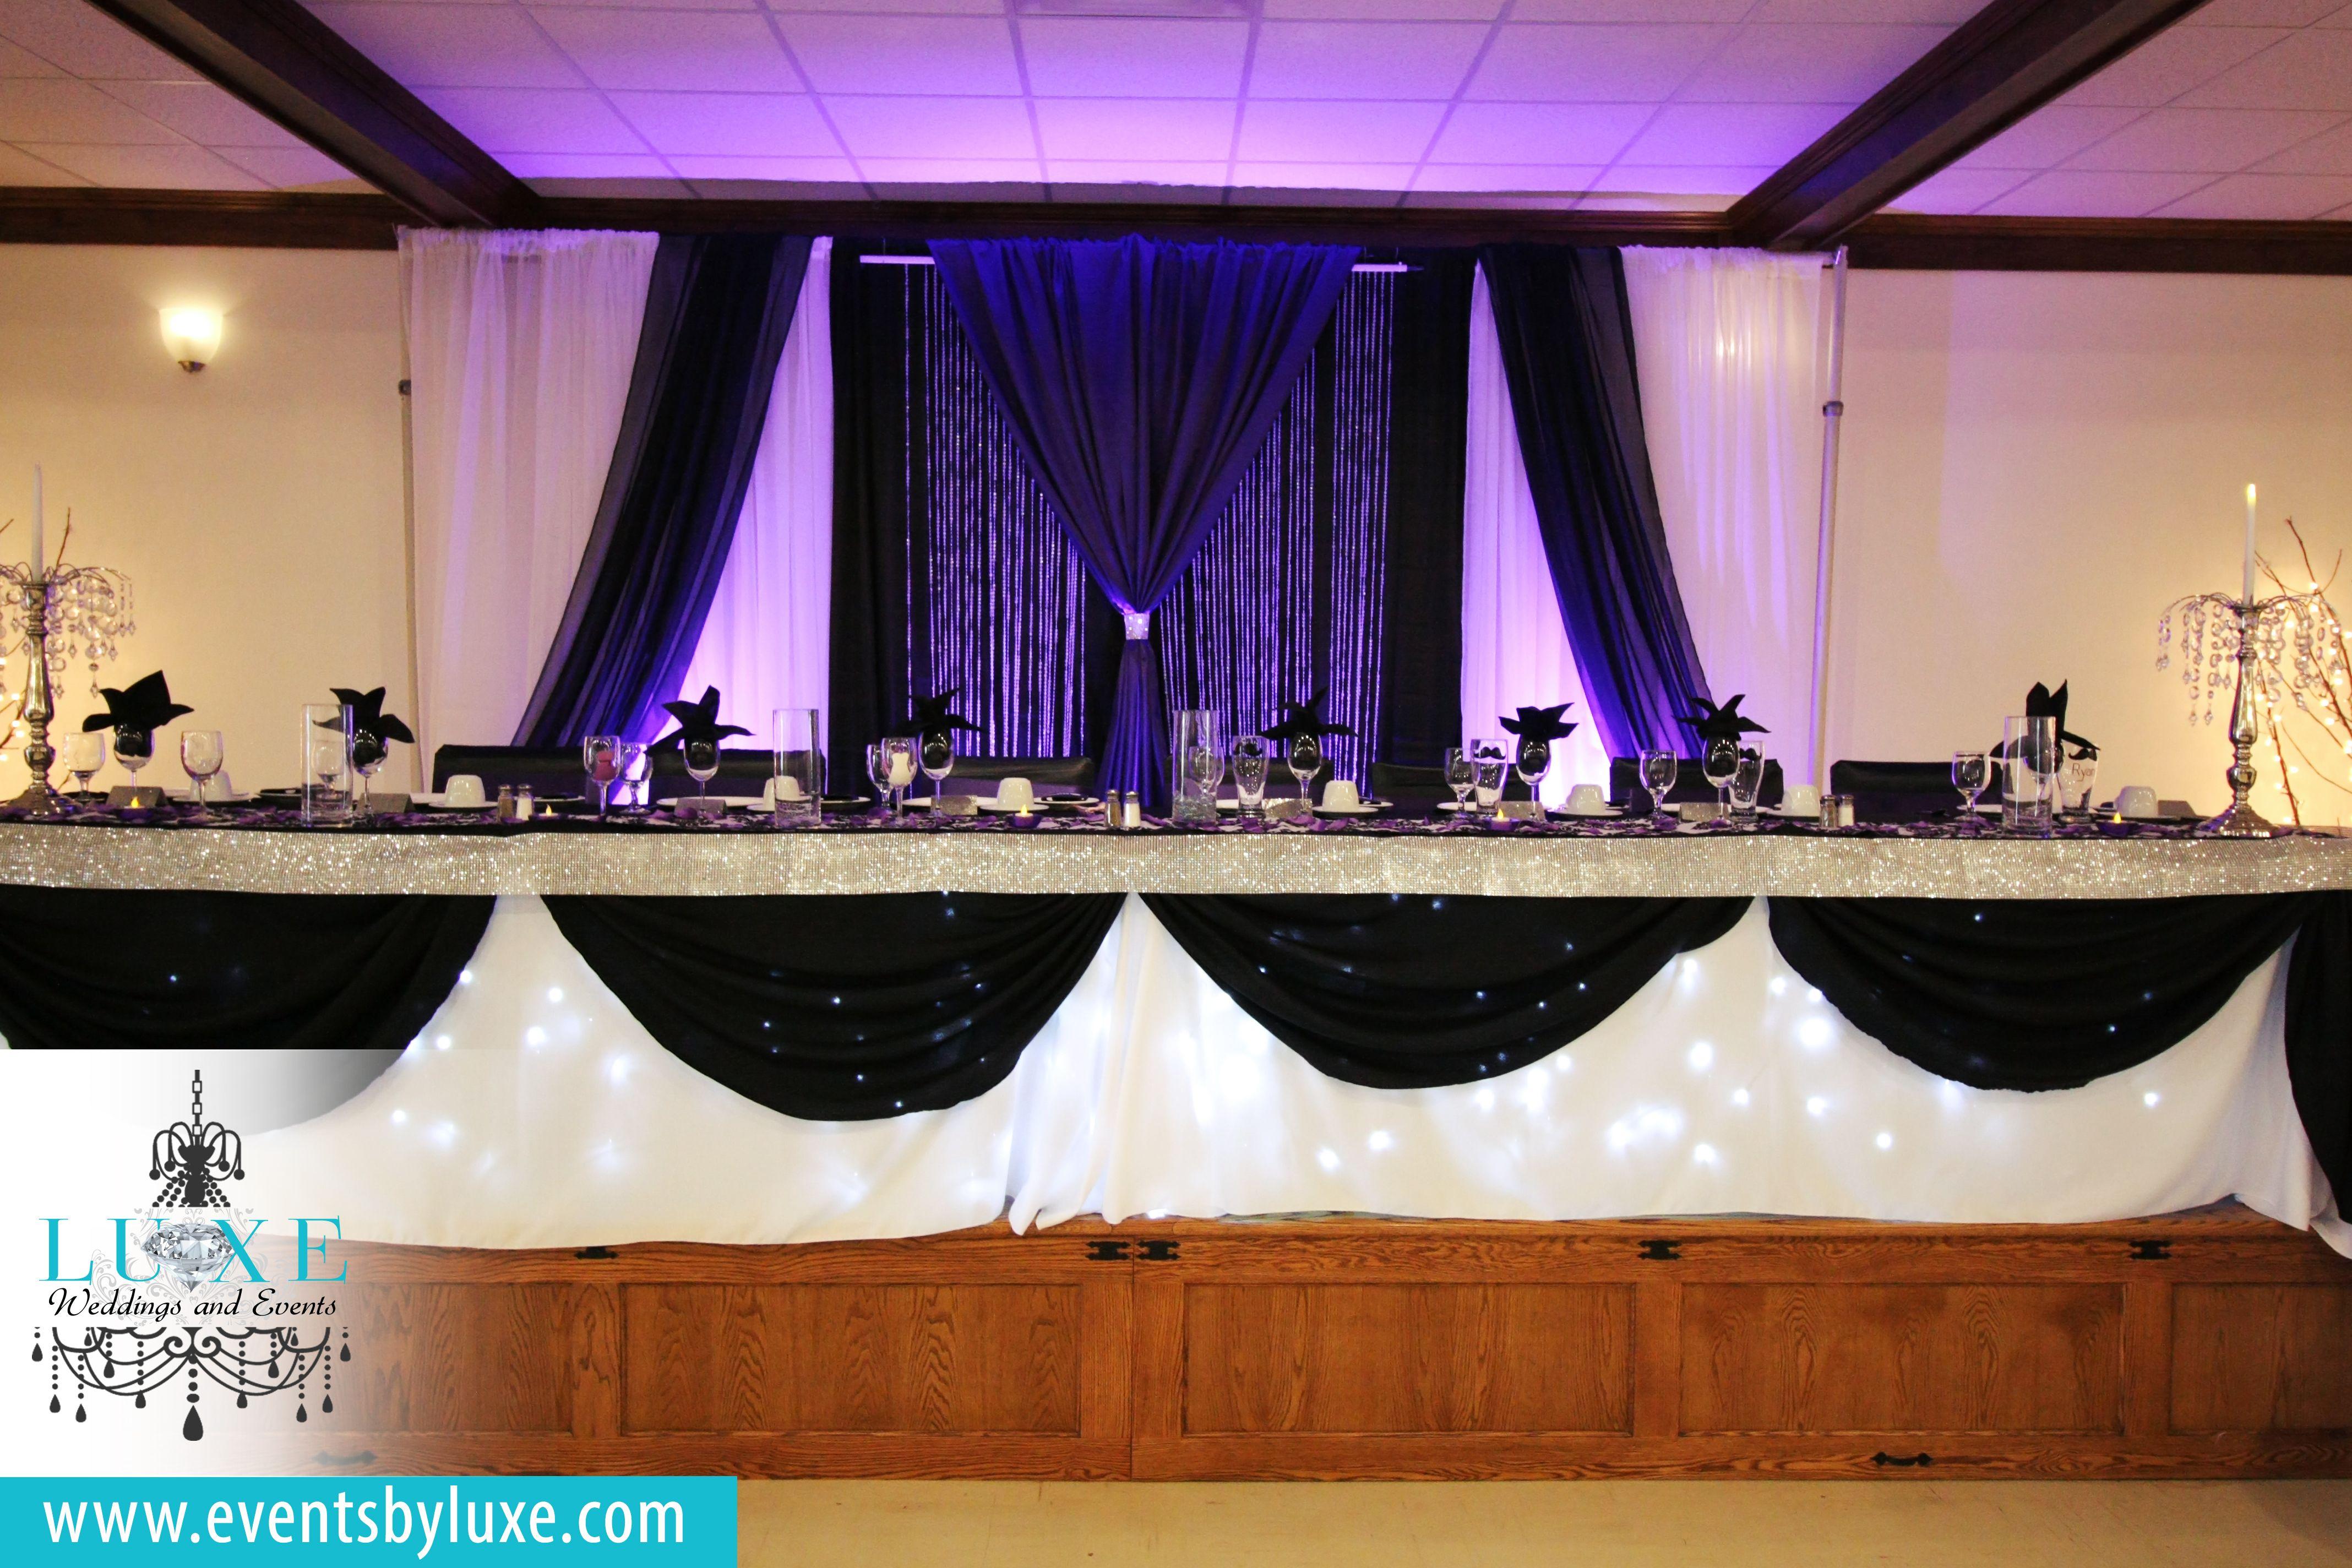 Black Purple And White Wedding Backdrop Modern Wedding Backdrop